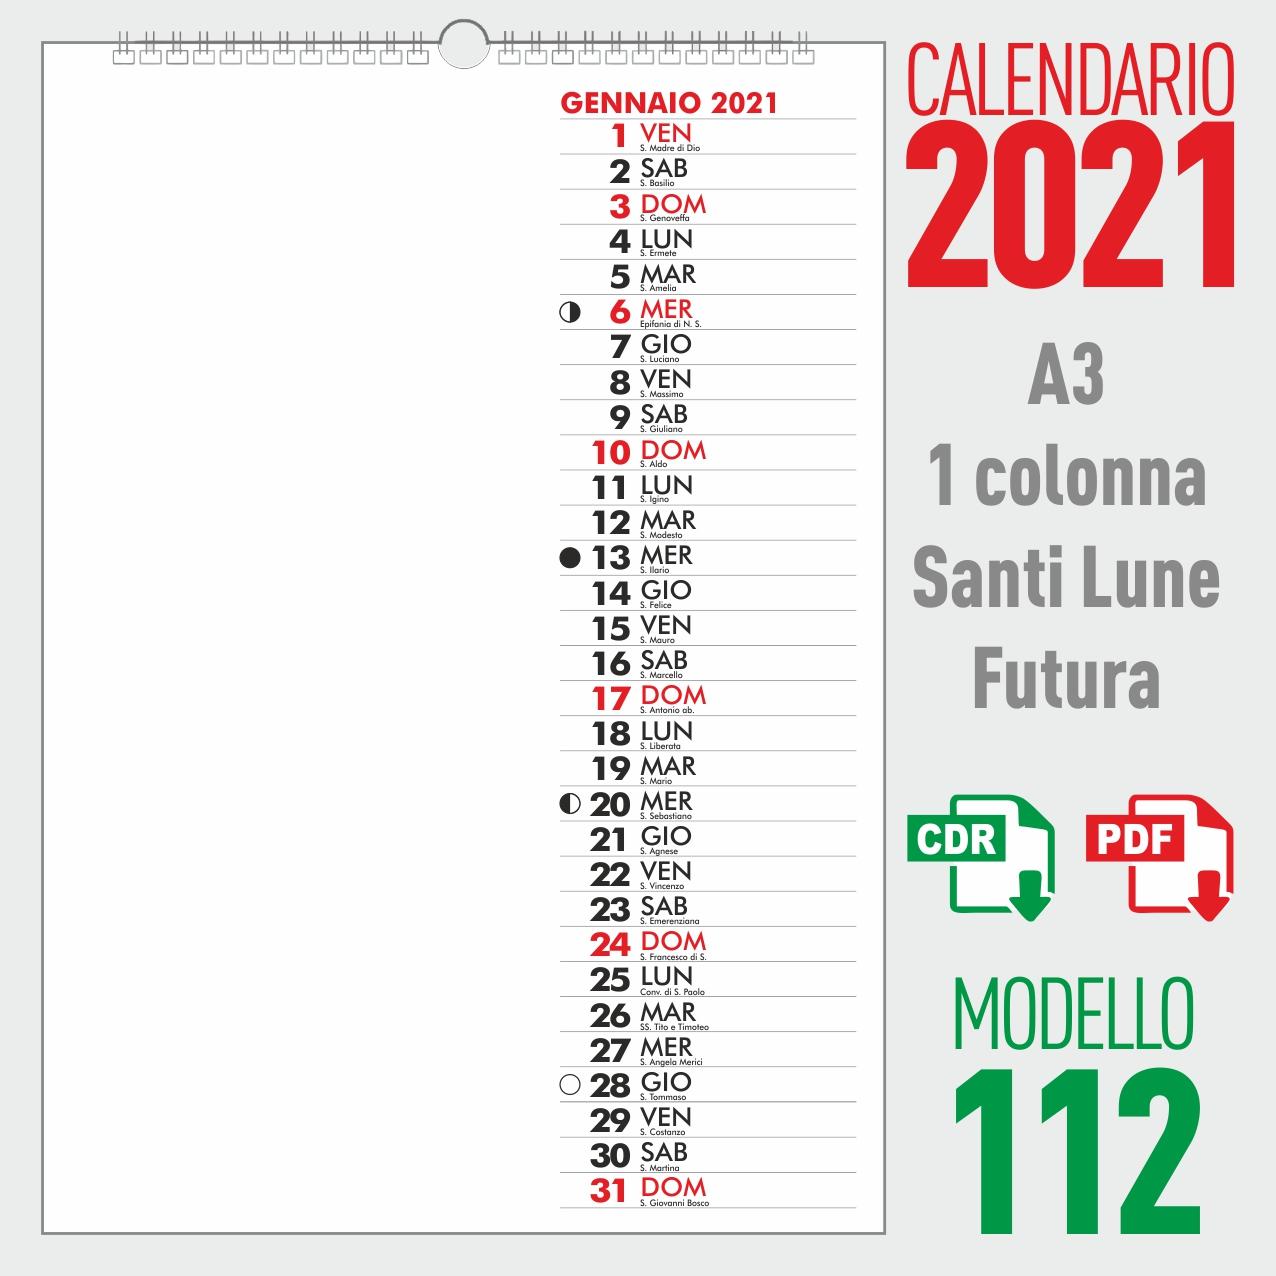 Calendario 2021 Santi e Lune – Calendario 2022 santi e lune